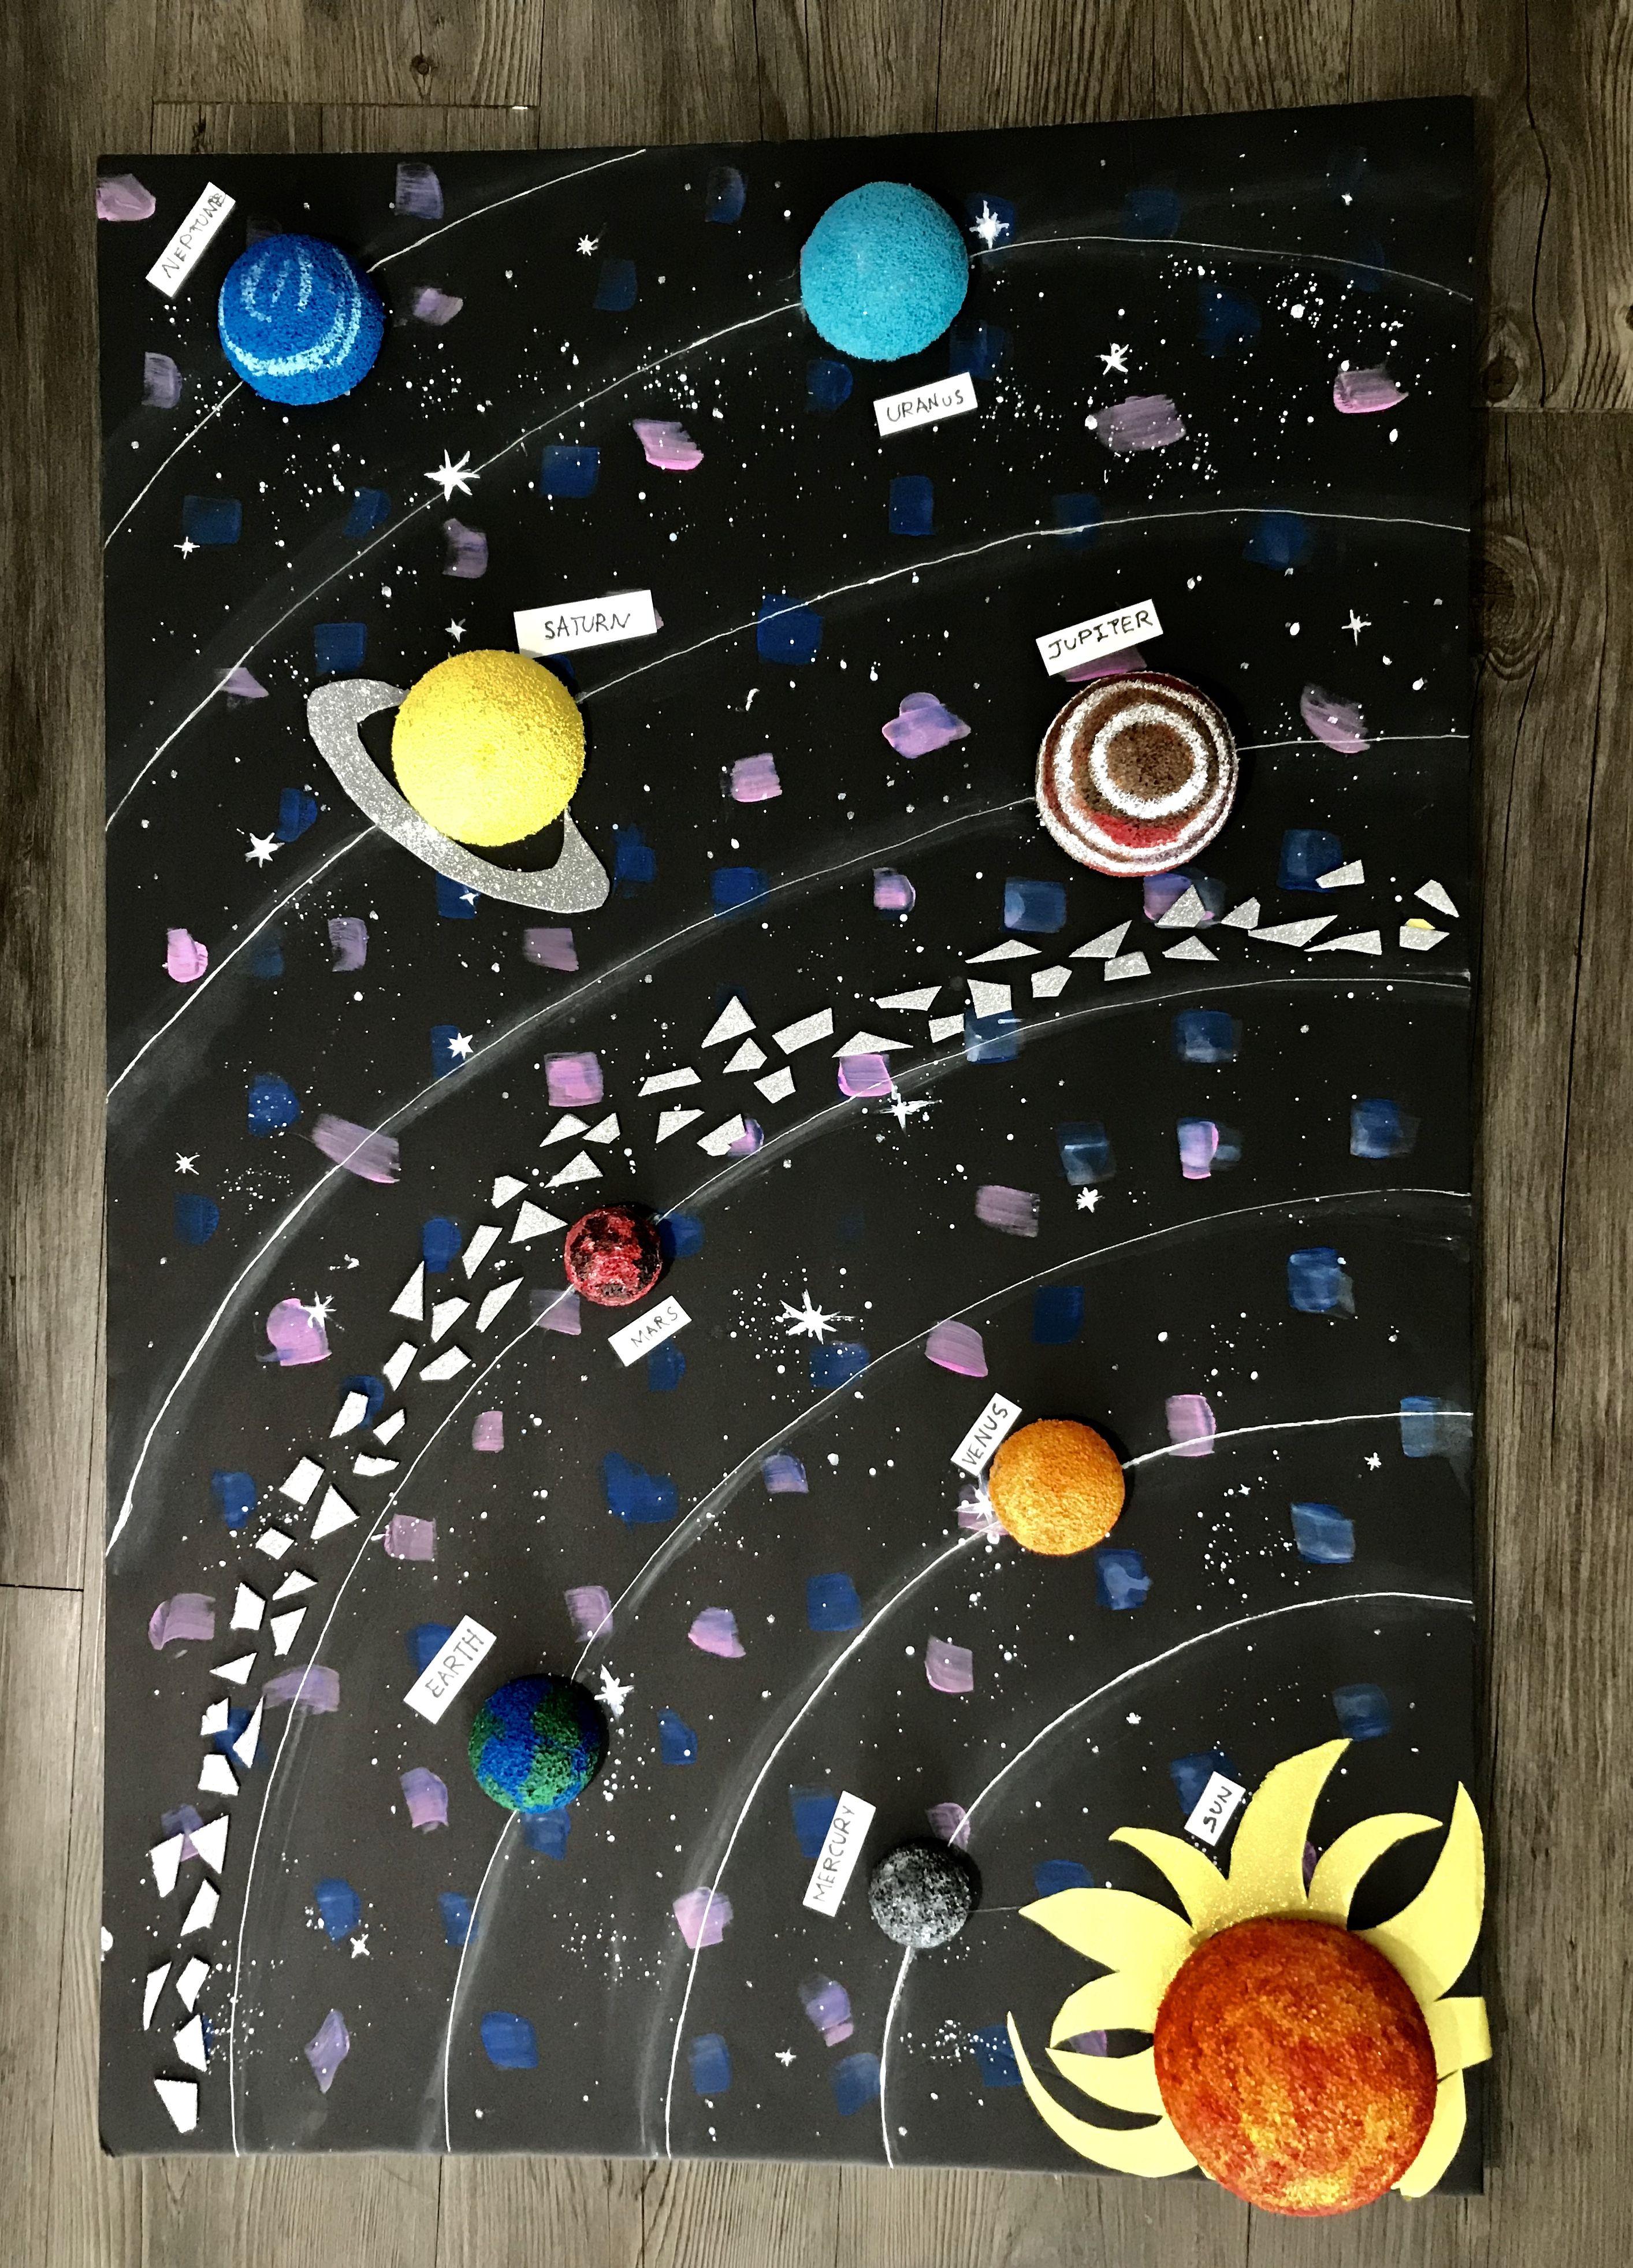 Easy School Project Solar System Handmade Using